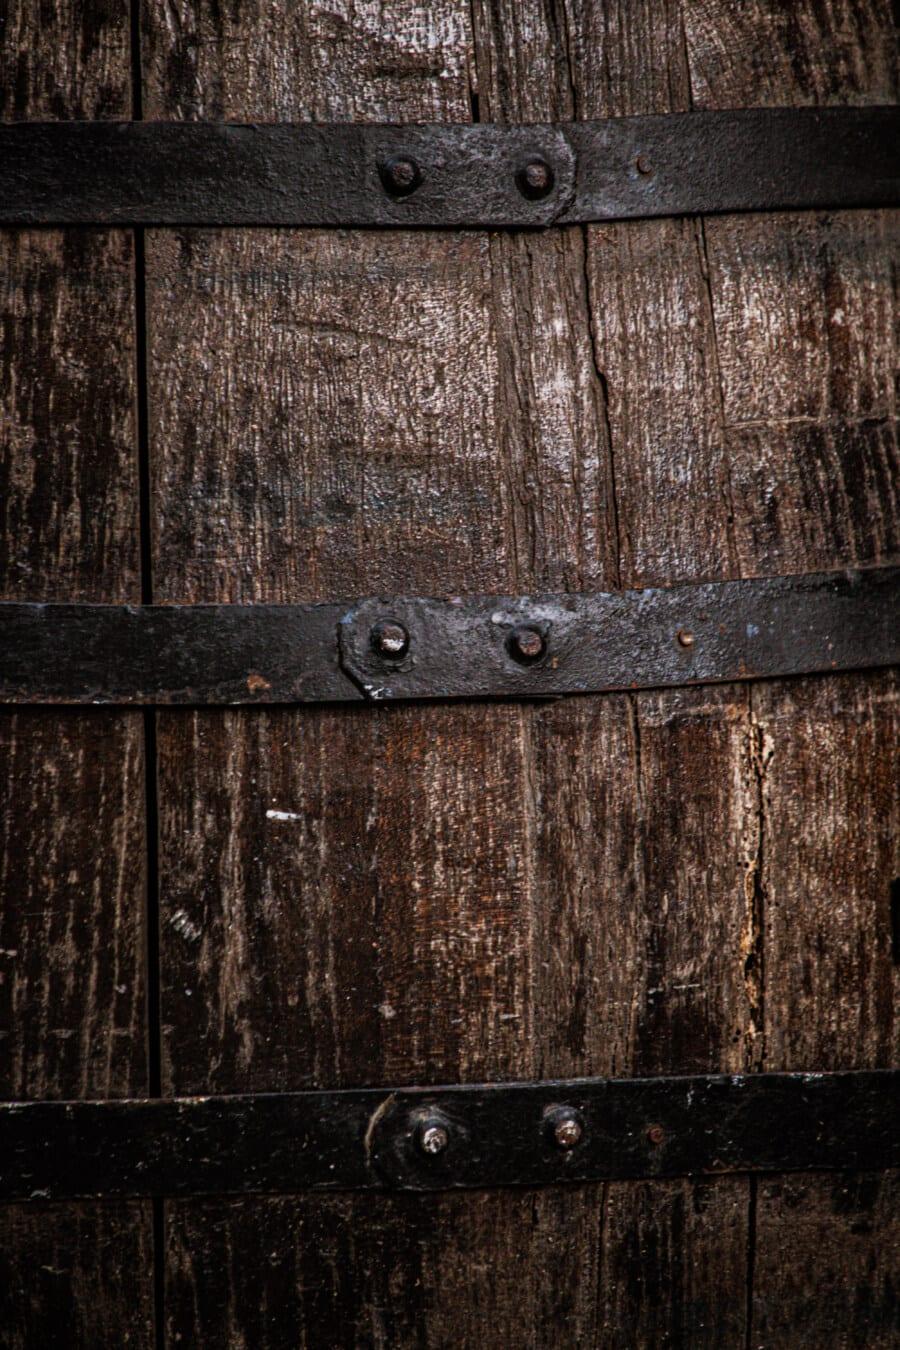 barrel, wooden, texture, planks, vintage, cast iron, iron, old, wood, board